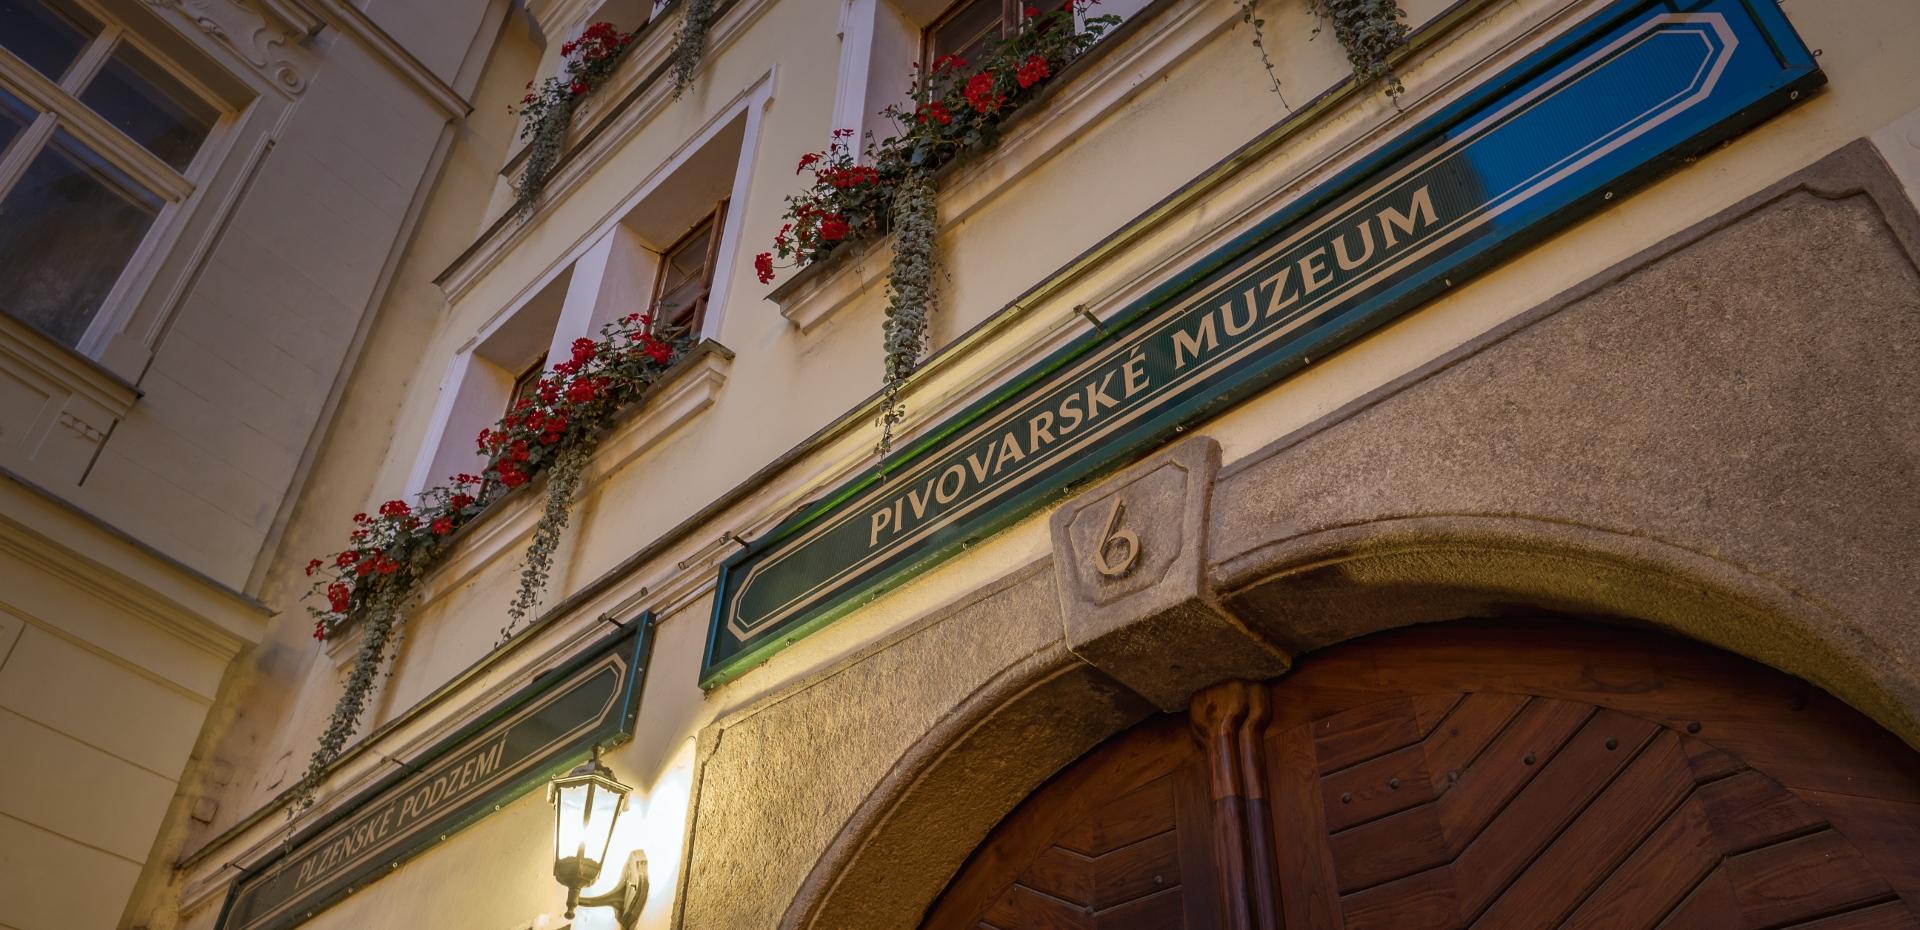 Vstup do Pivovarského muzea v Plzni